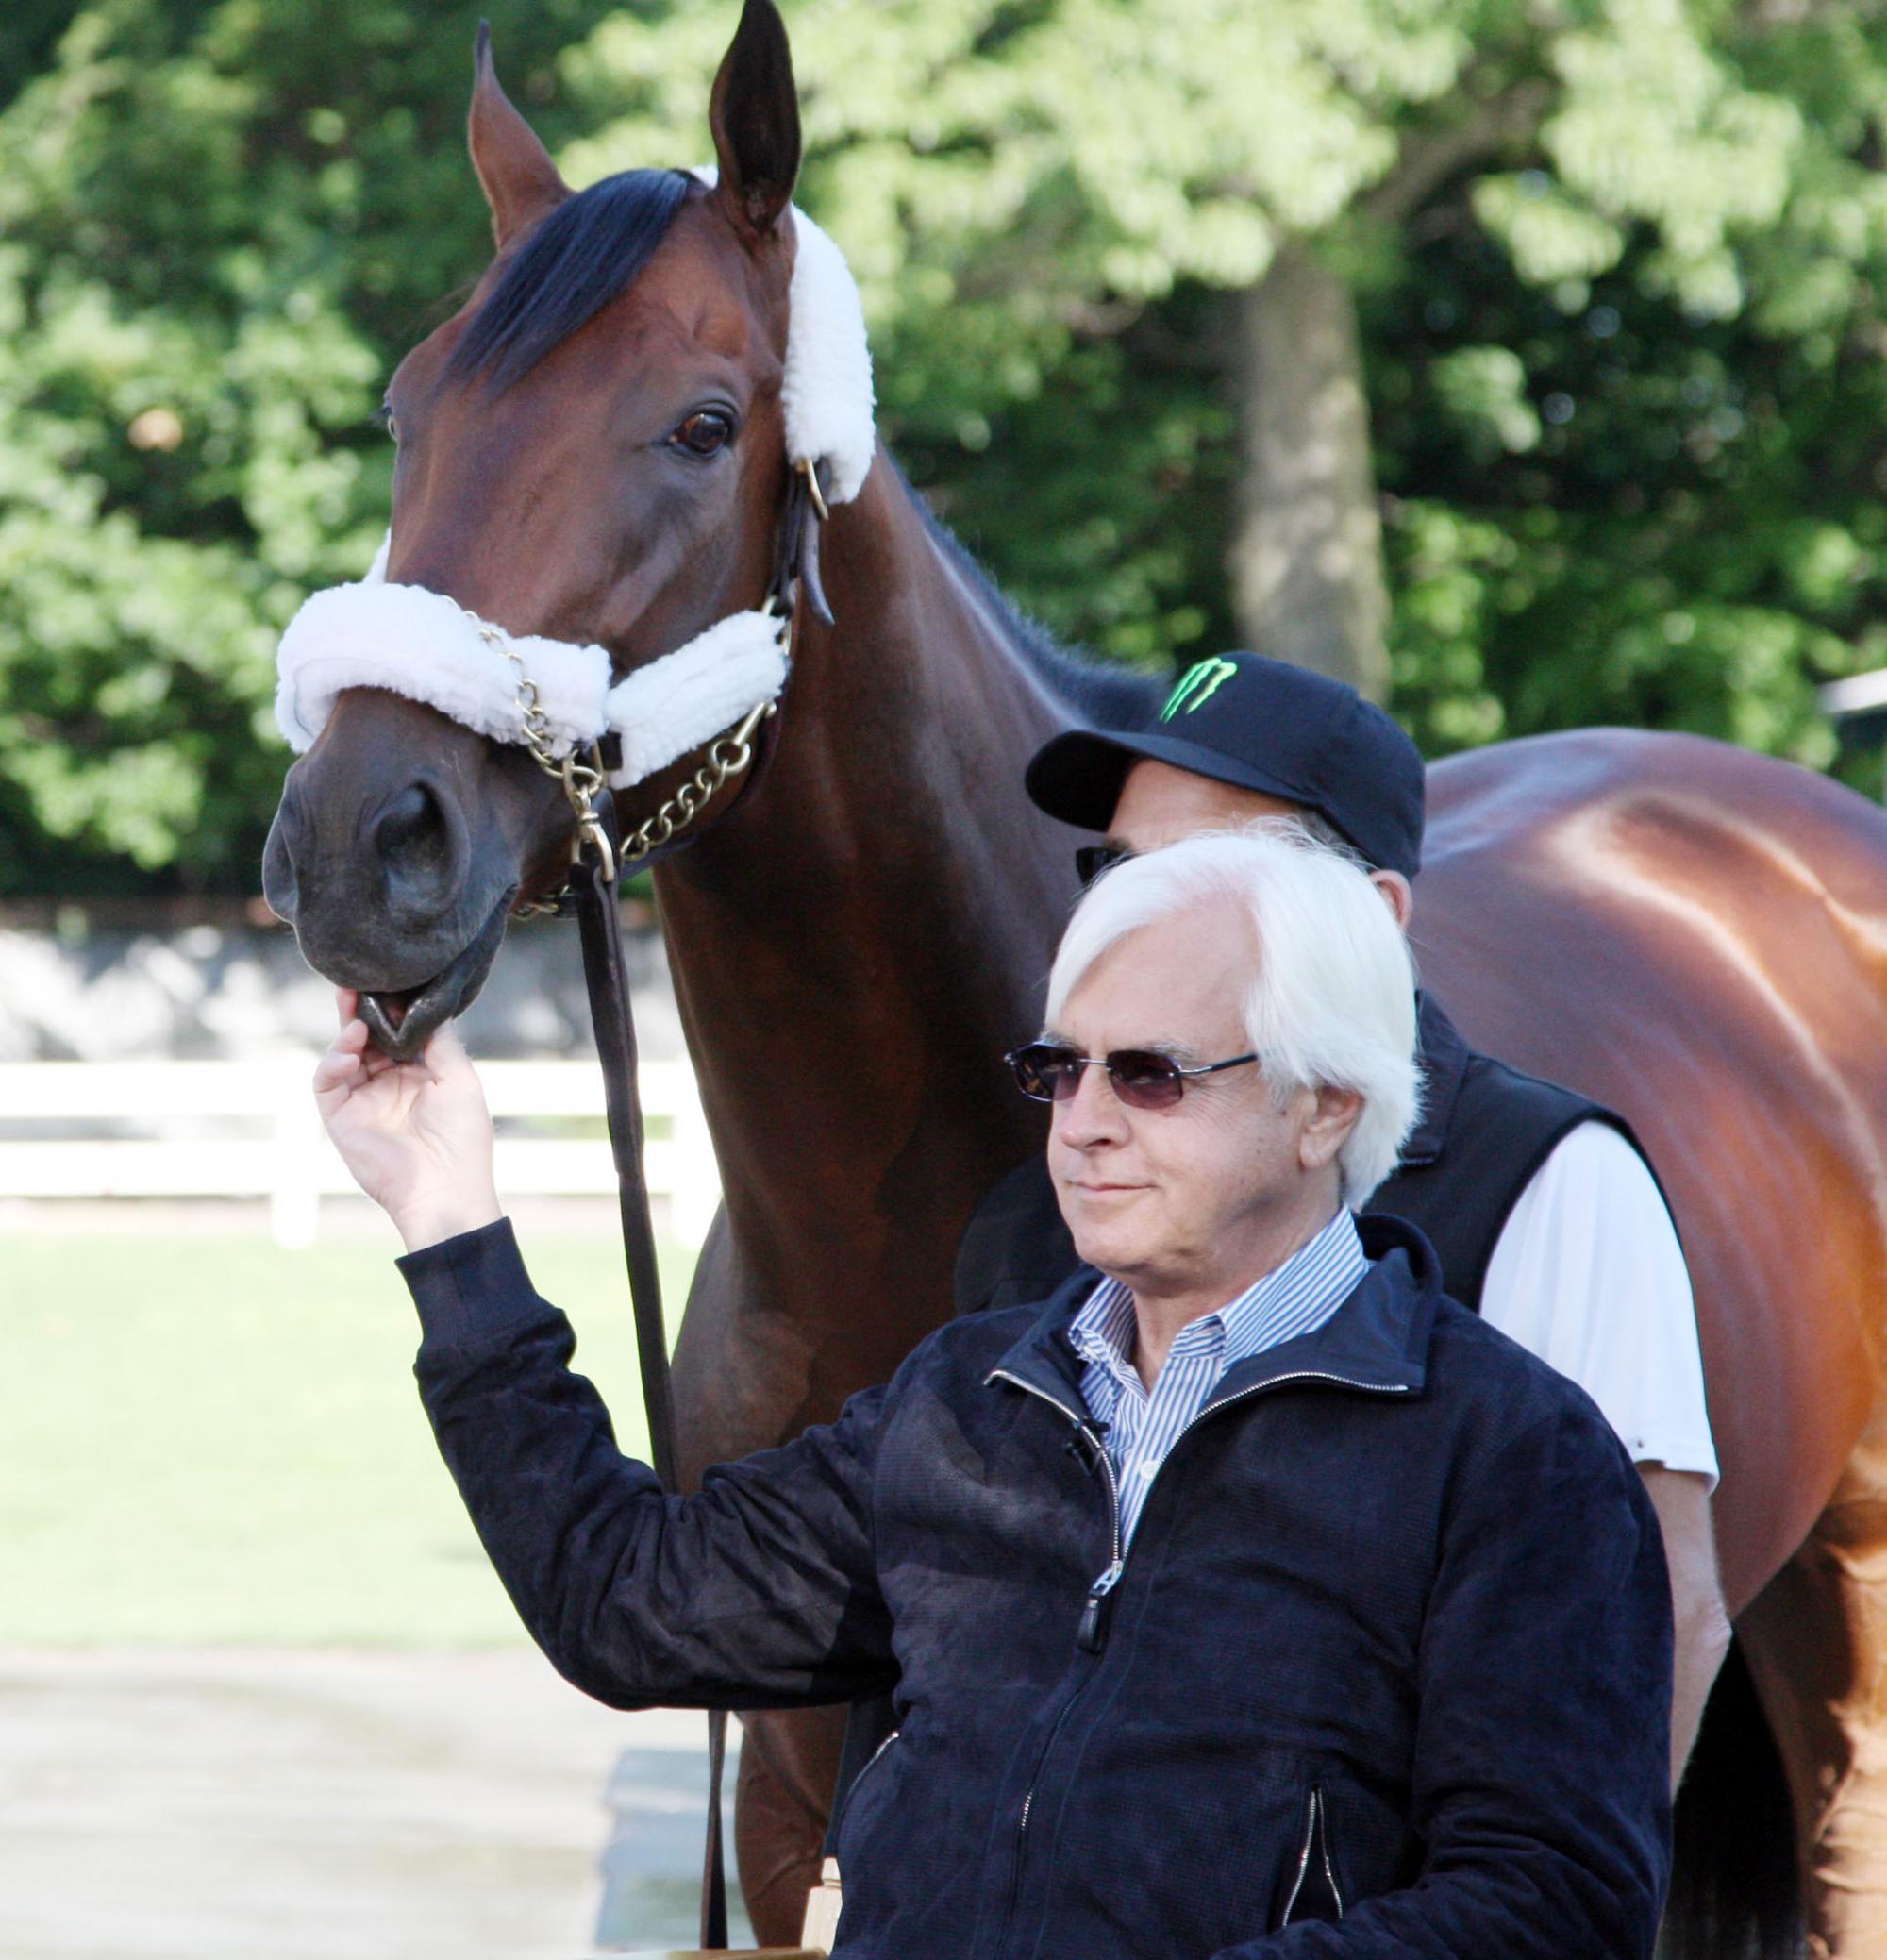 On top of the horse racing world: American Pharoah and Bob Baffert